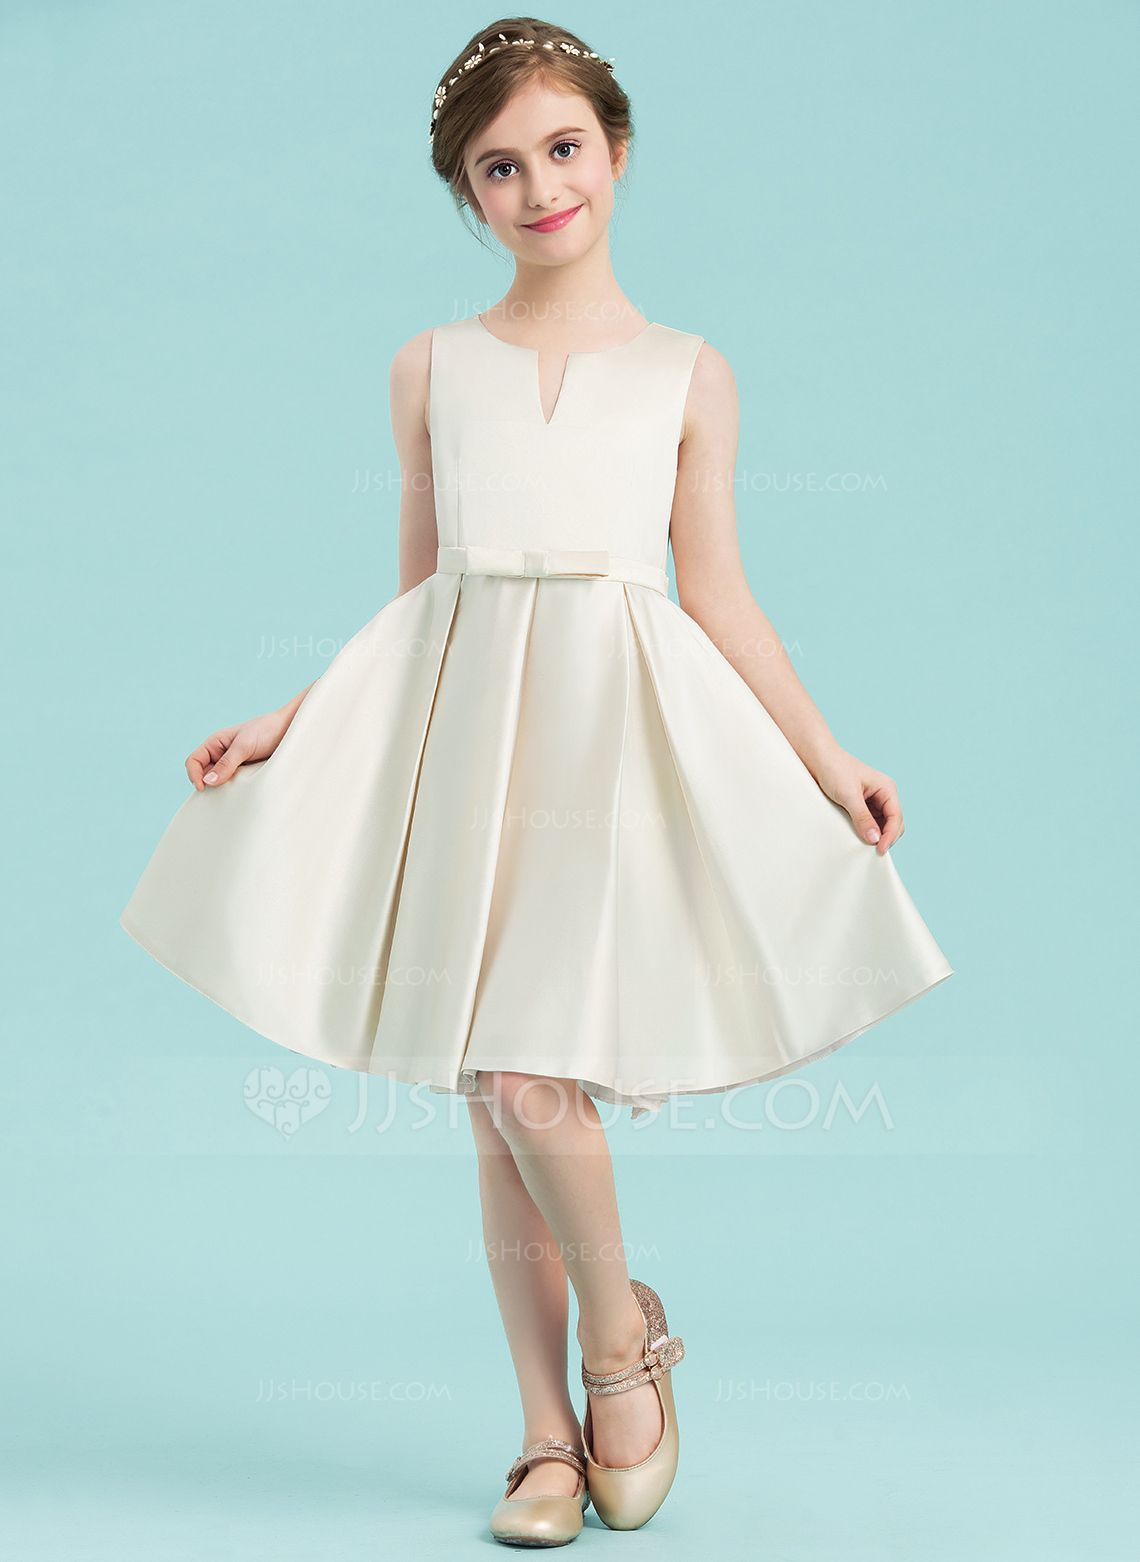 8479865de2d Ivory Satin Junior Bridesmaid Dress